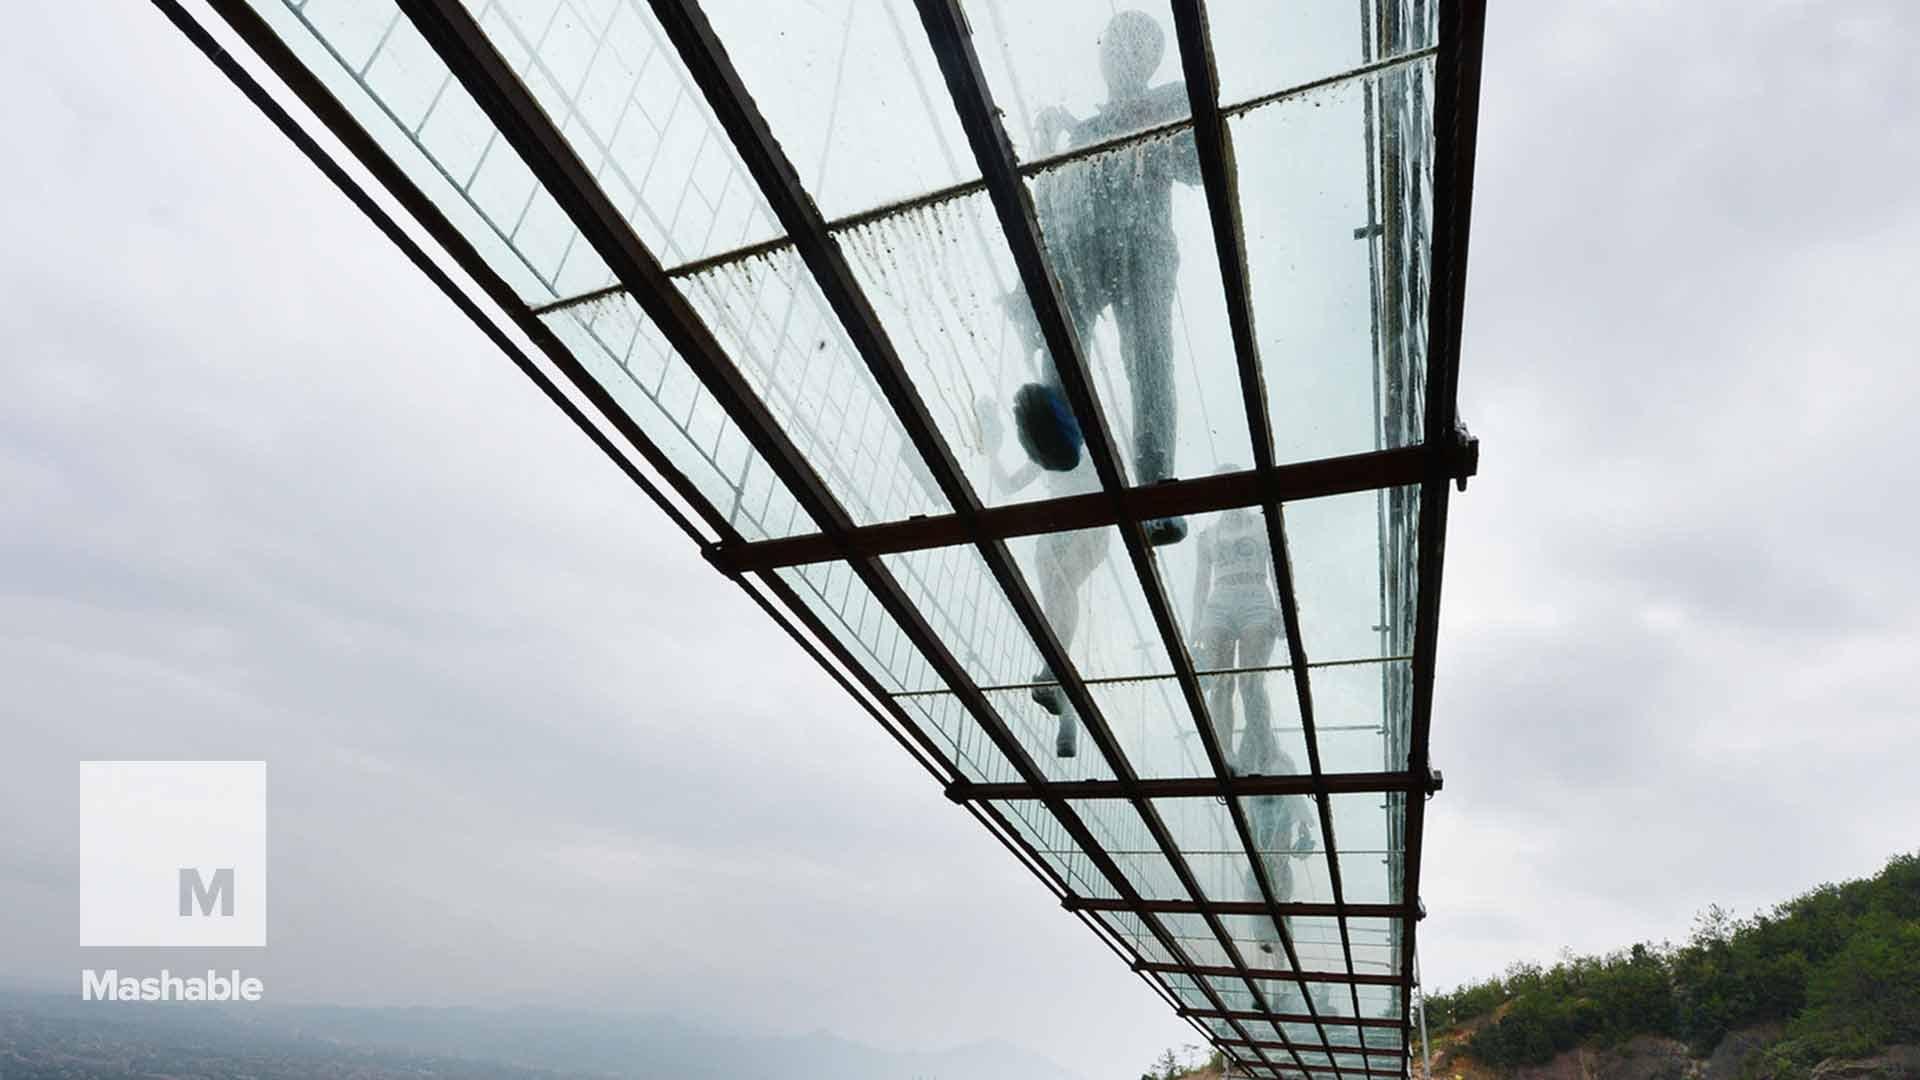 Take a 900-Foot Walk Over a Gorge Via a Glass-Bottomed Bridge